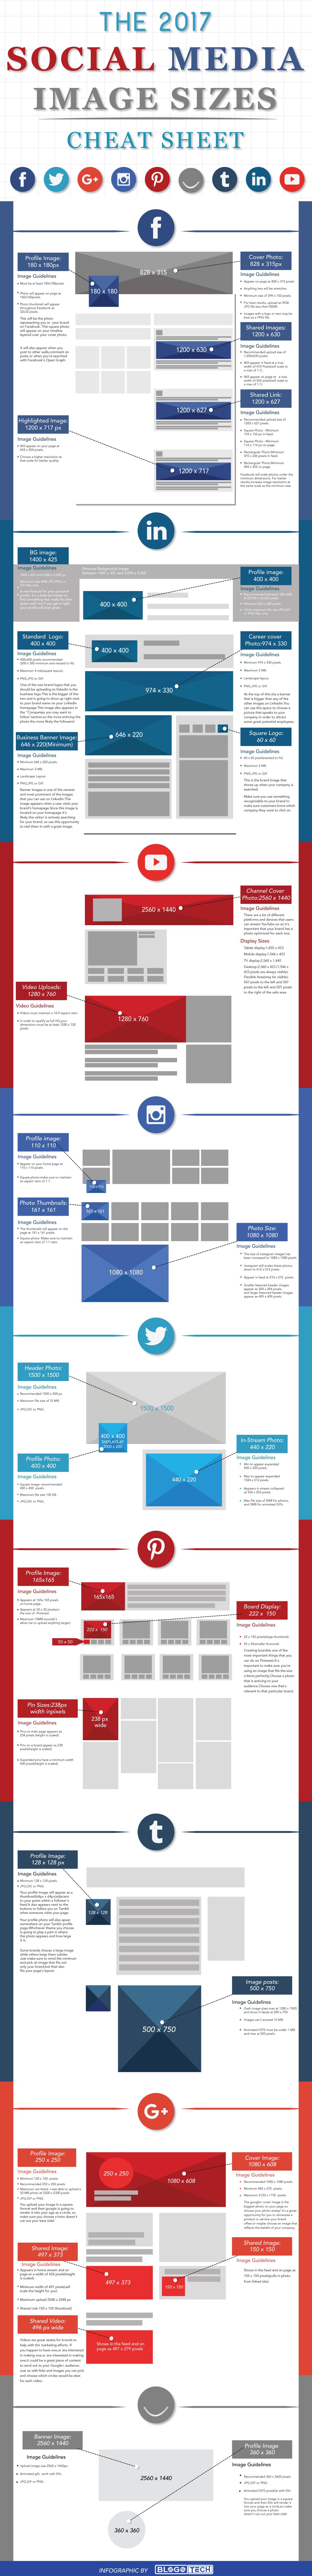 2017-Social-Media-Image-Sizes-Cheat-Sheet